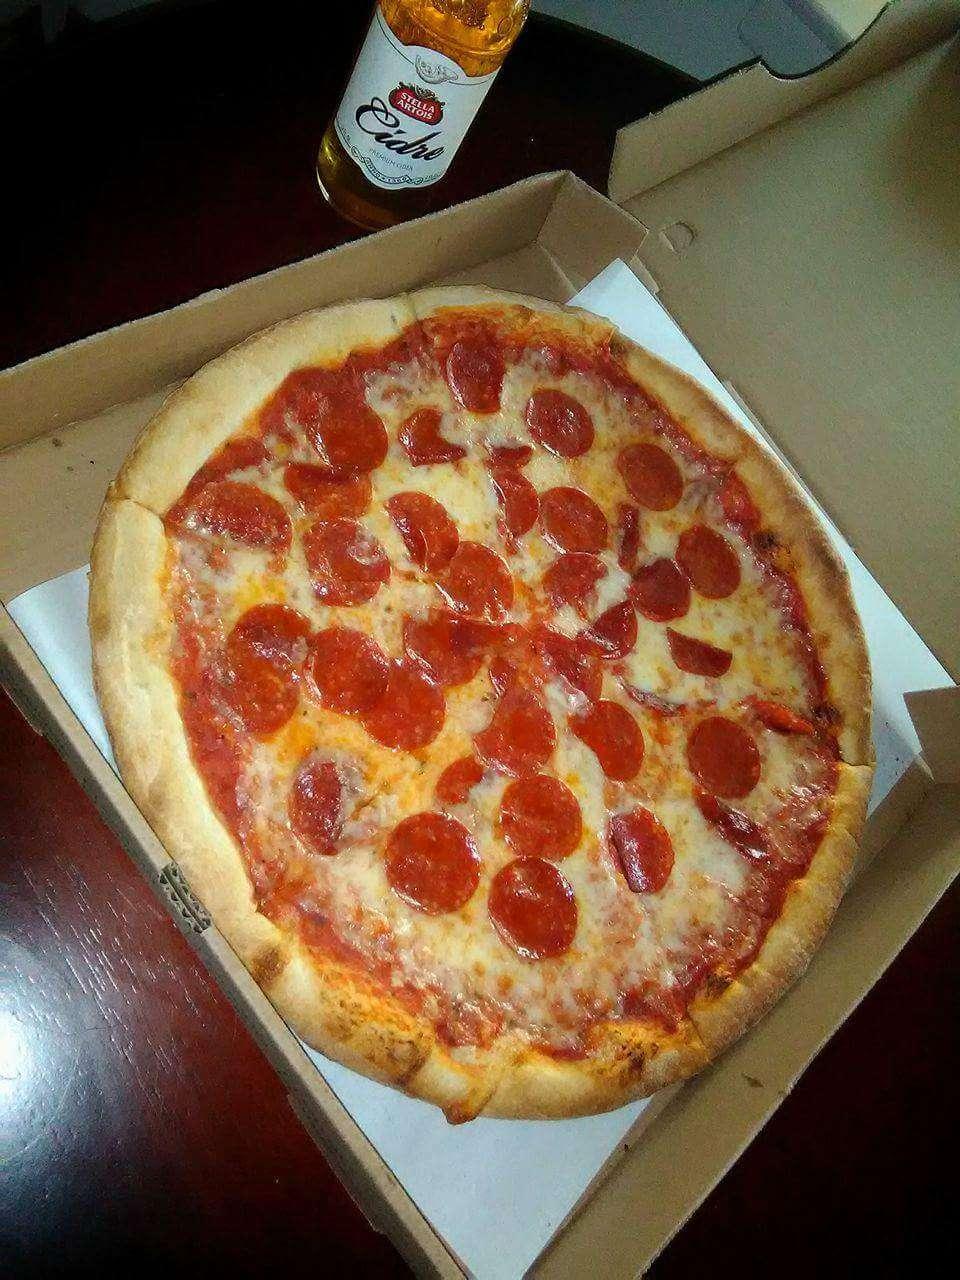 Two cousins pizza Columbia Avenue Lancaster - restaurant    Photo 1 of 9   Address: 1762 Columbia Ave, Lancaster, PA 17603, USA   Phone: (717) 399-8888